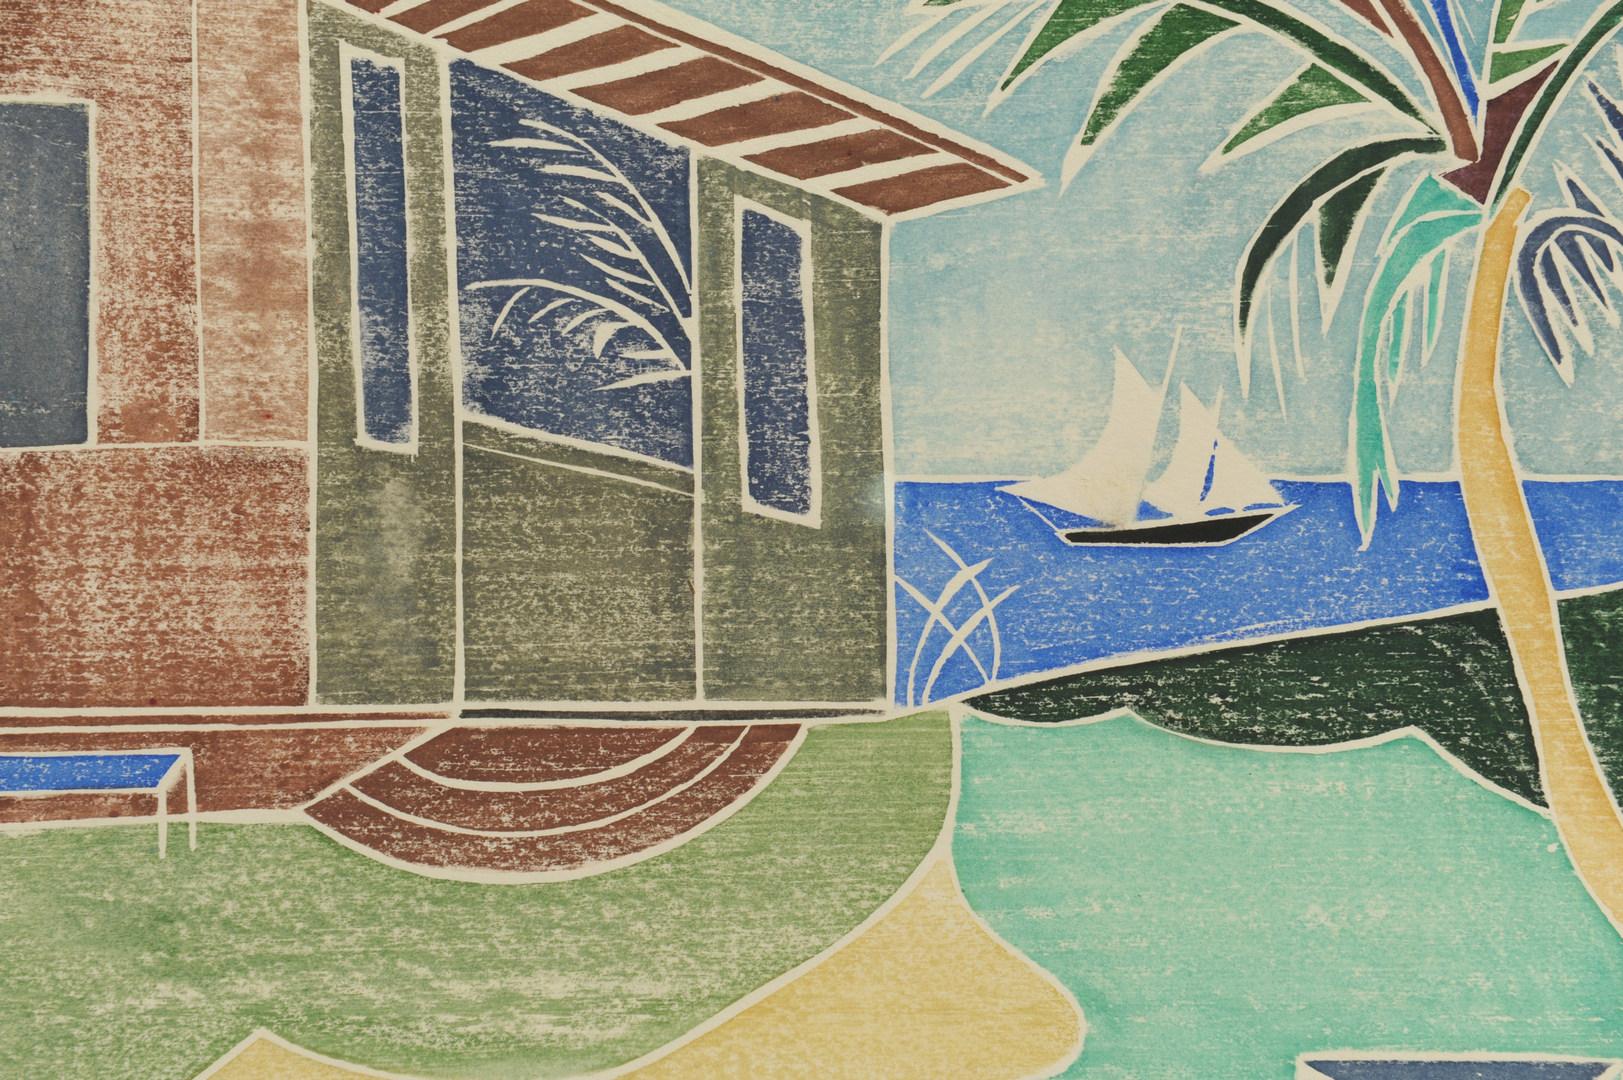 Lot 339: 2 Beulah Tomlinson Wood Cut Block Prints: Sea Hous